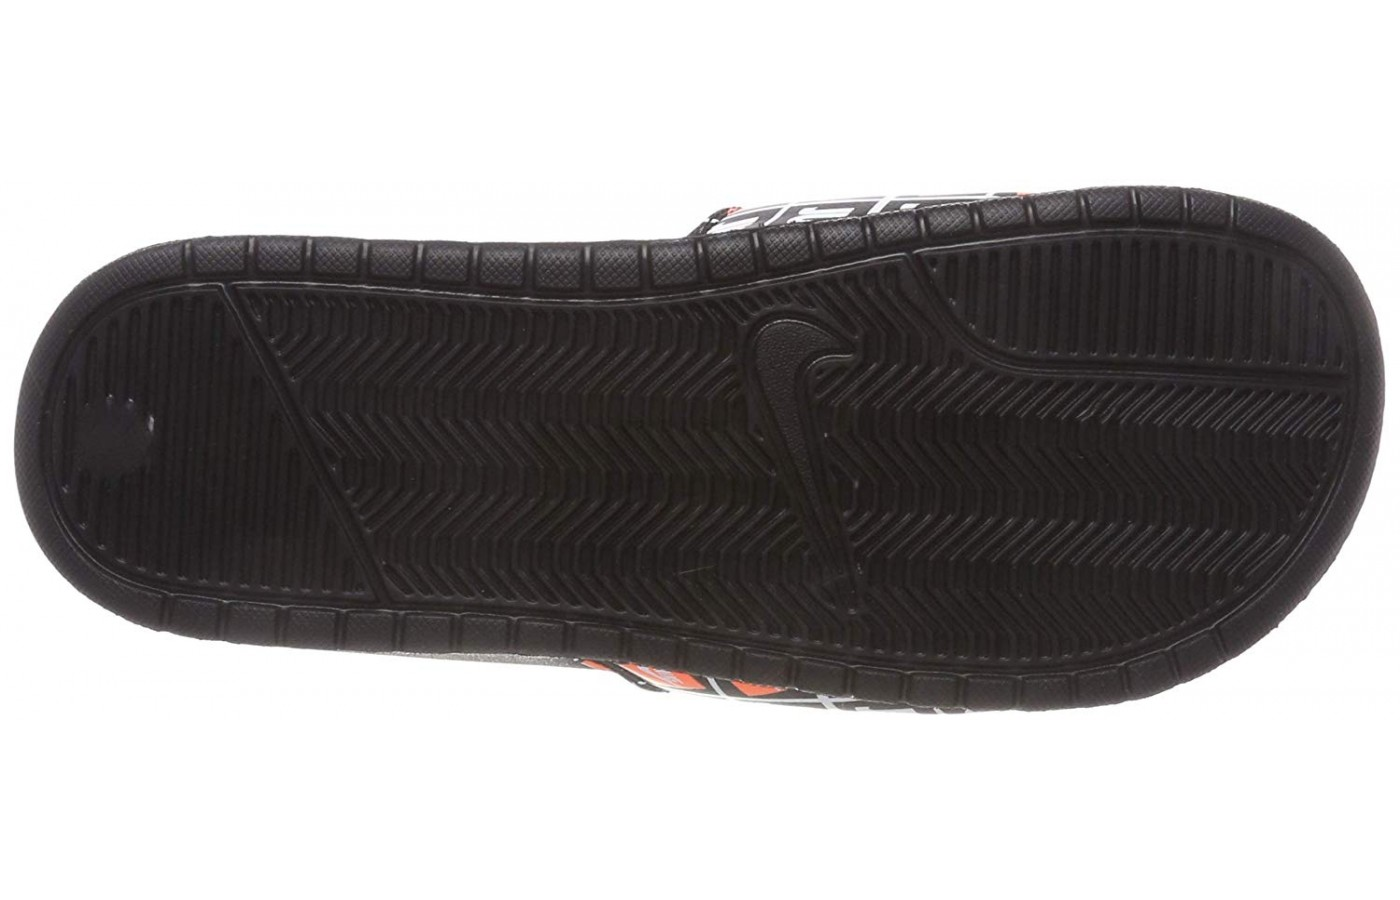 Nike Benassi JDI Slide Sole